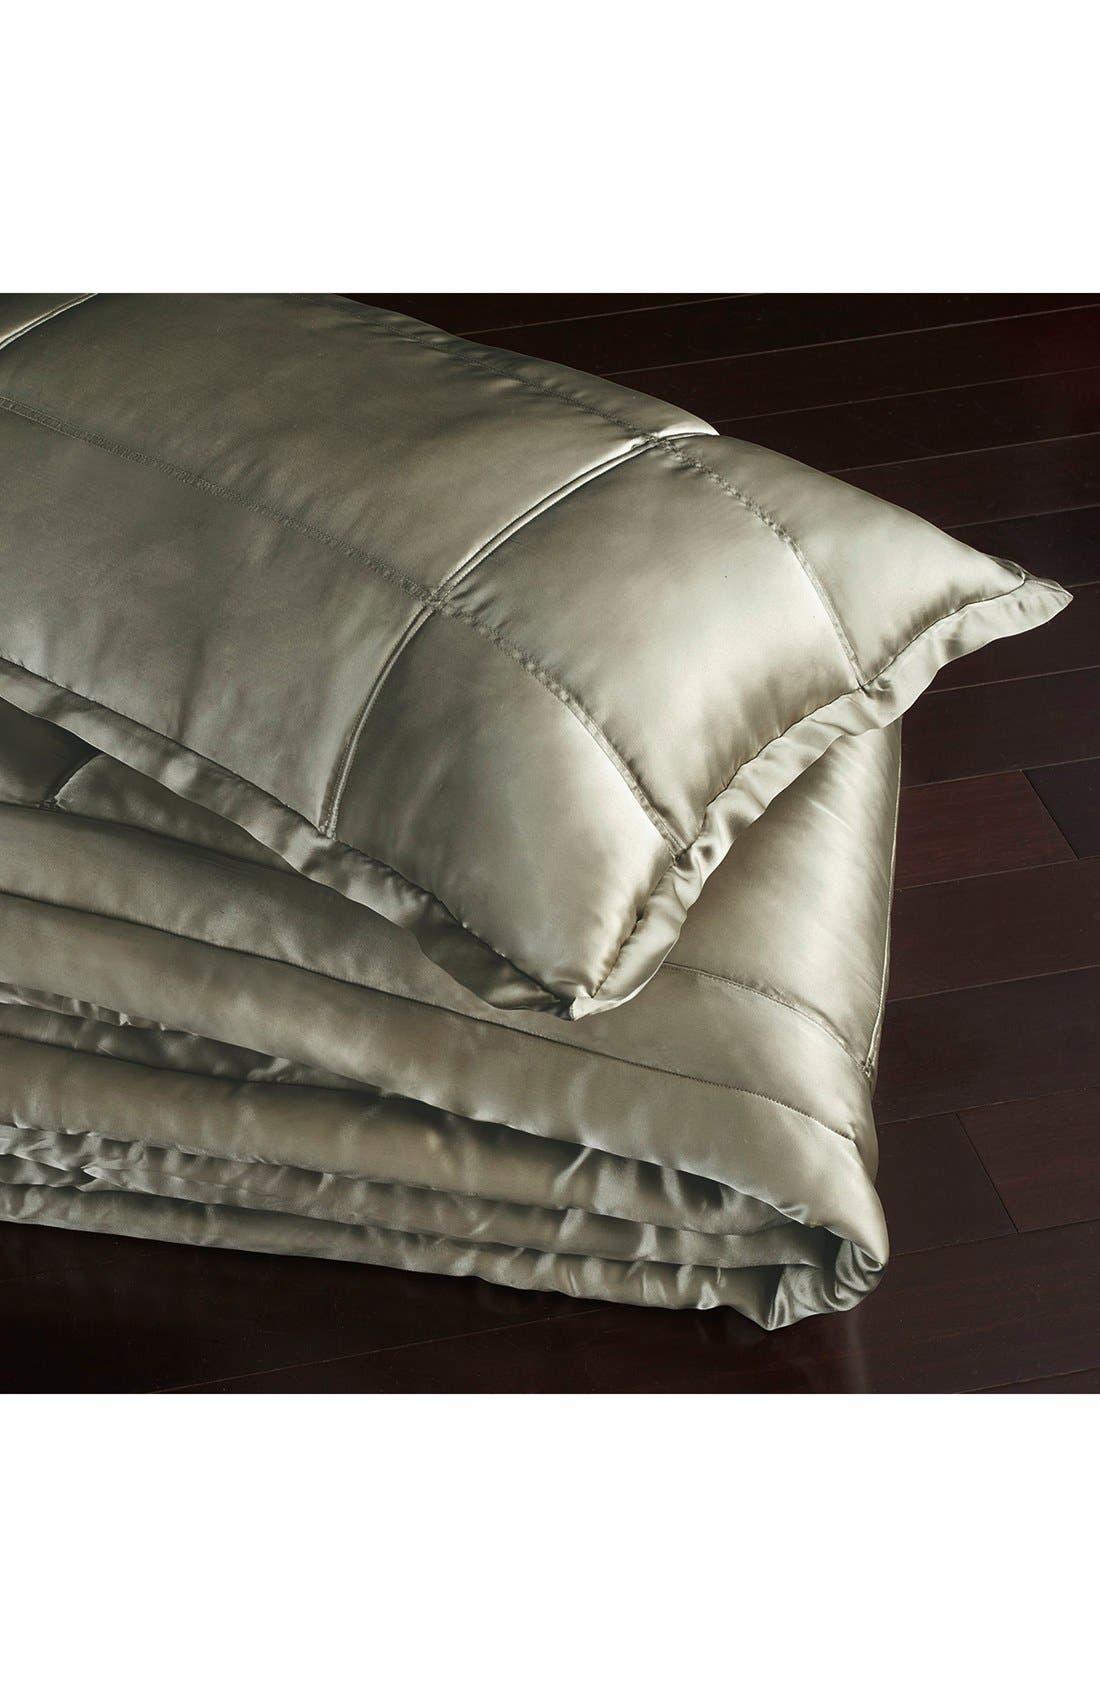 Donna Karan New York 'Exhale' Silk Charmeuse Quilt & Shams